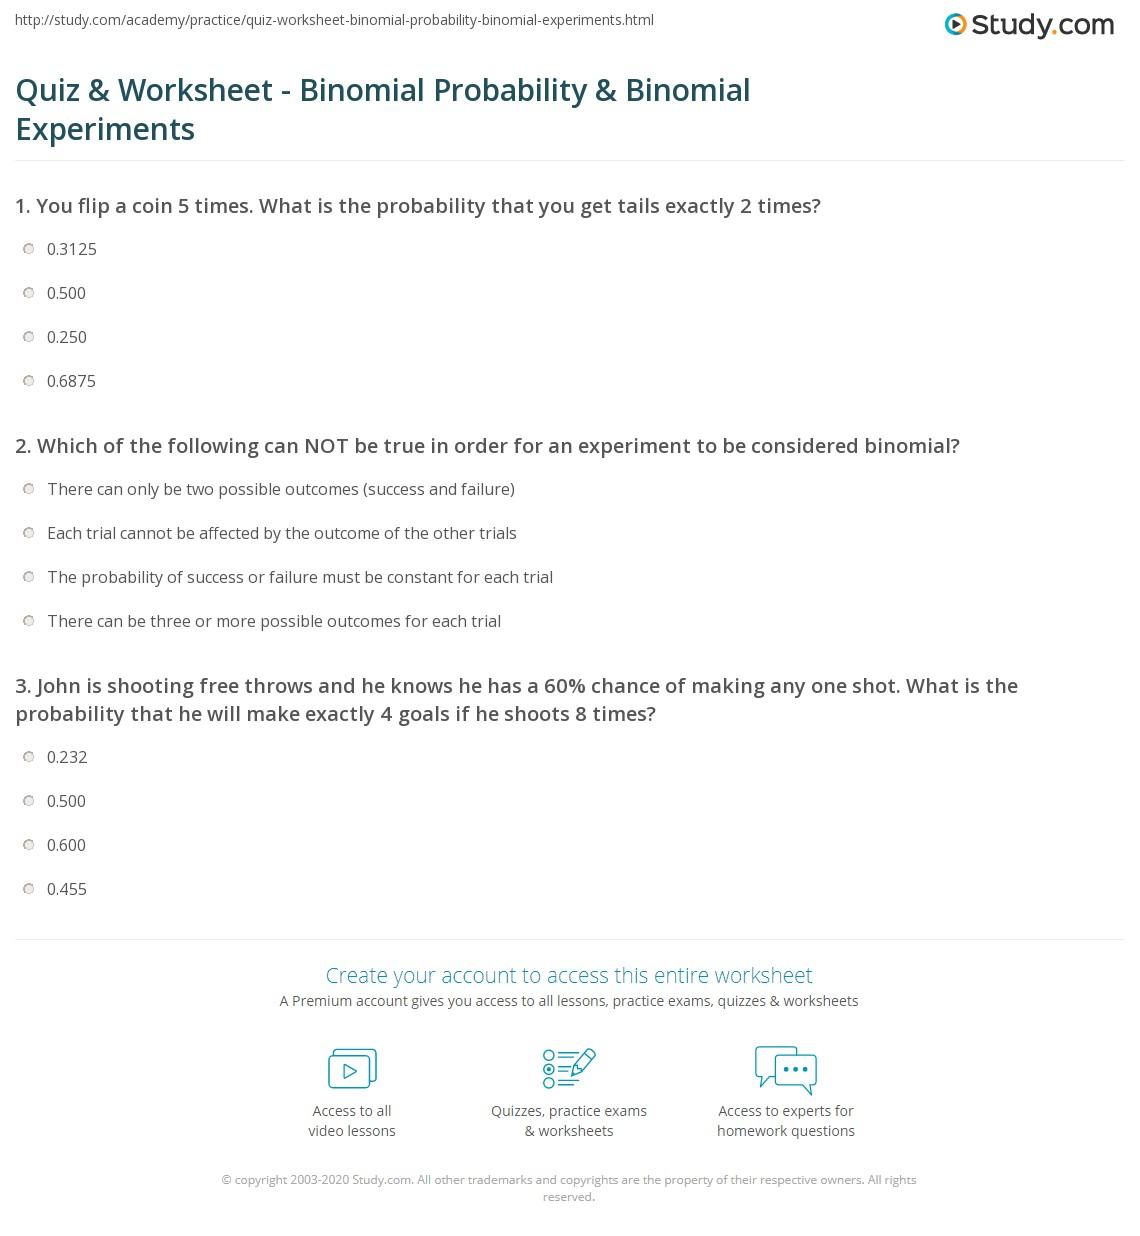 quiz worksheet binomial probability binomial experiments. Black Bedroom Furniture Sets. Home Design Ideas